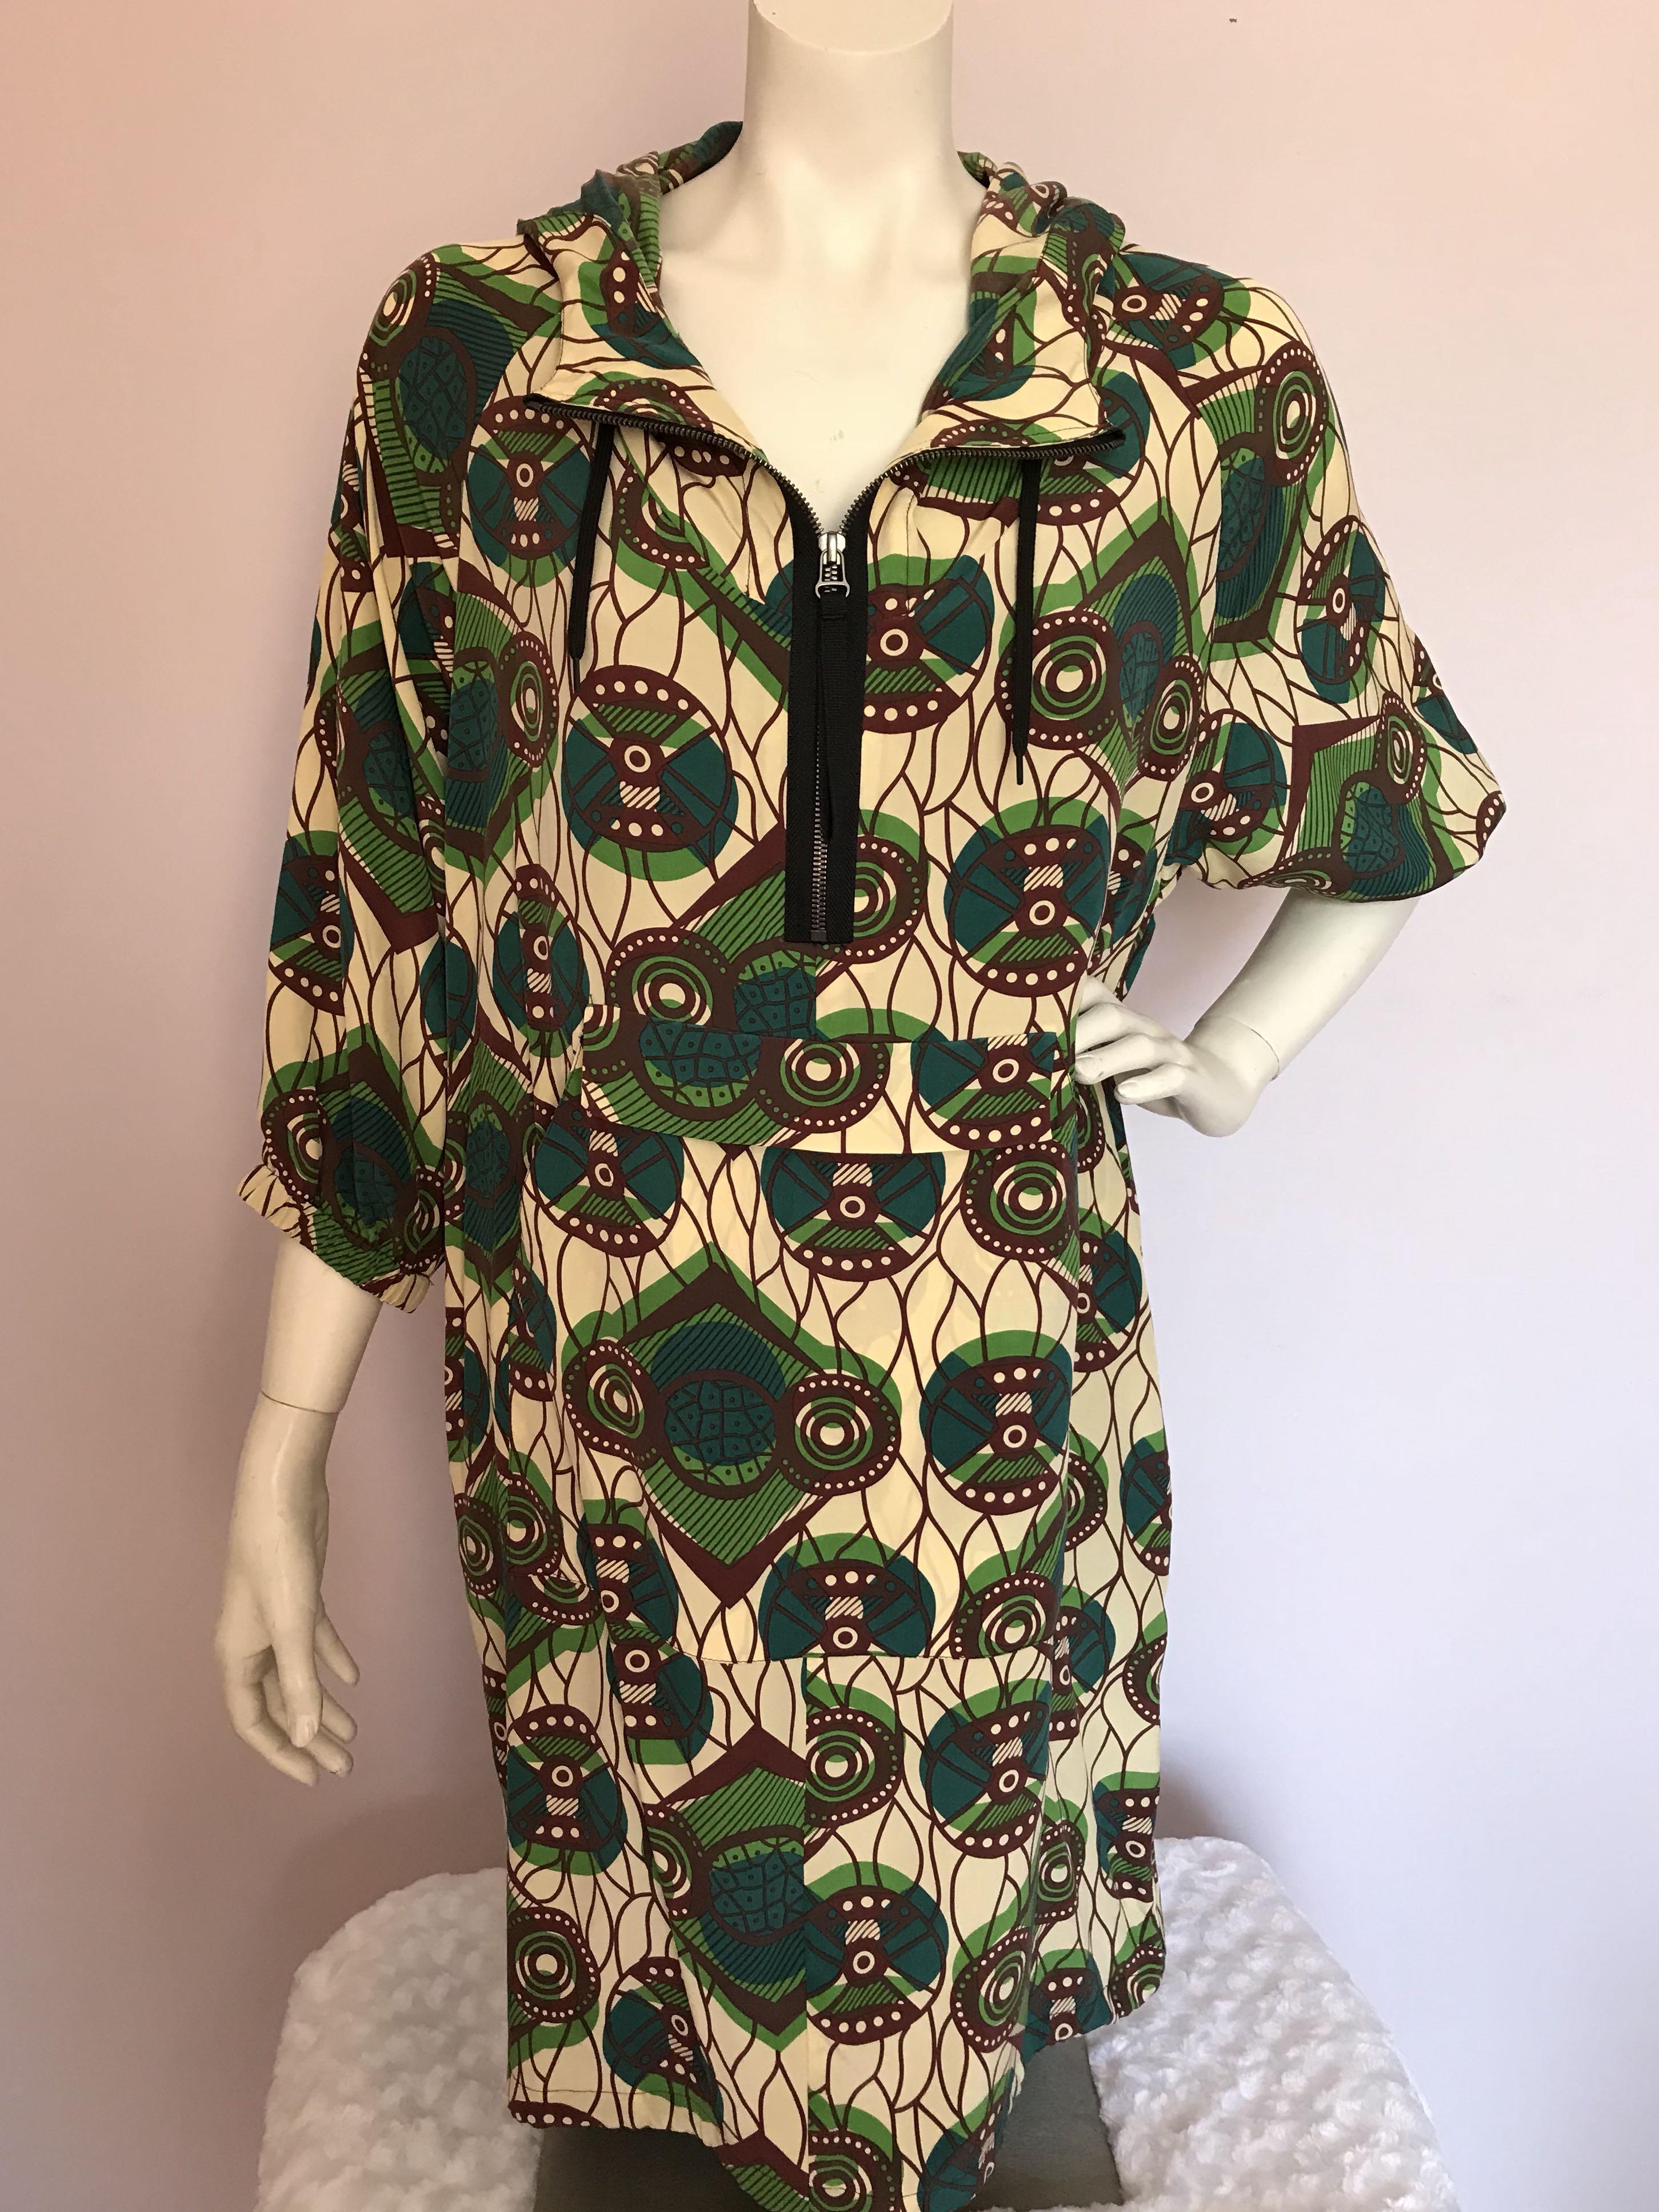 MARNI at H&M 100% Silk Hooded Dress Sz 4 Small